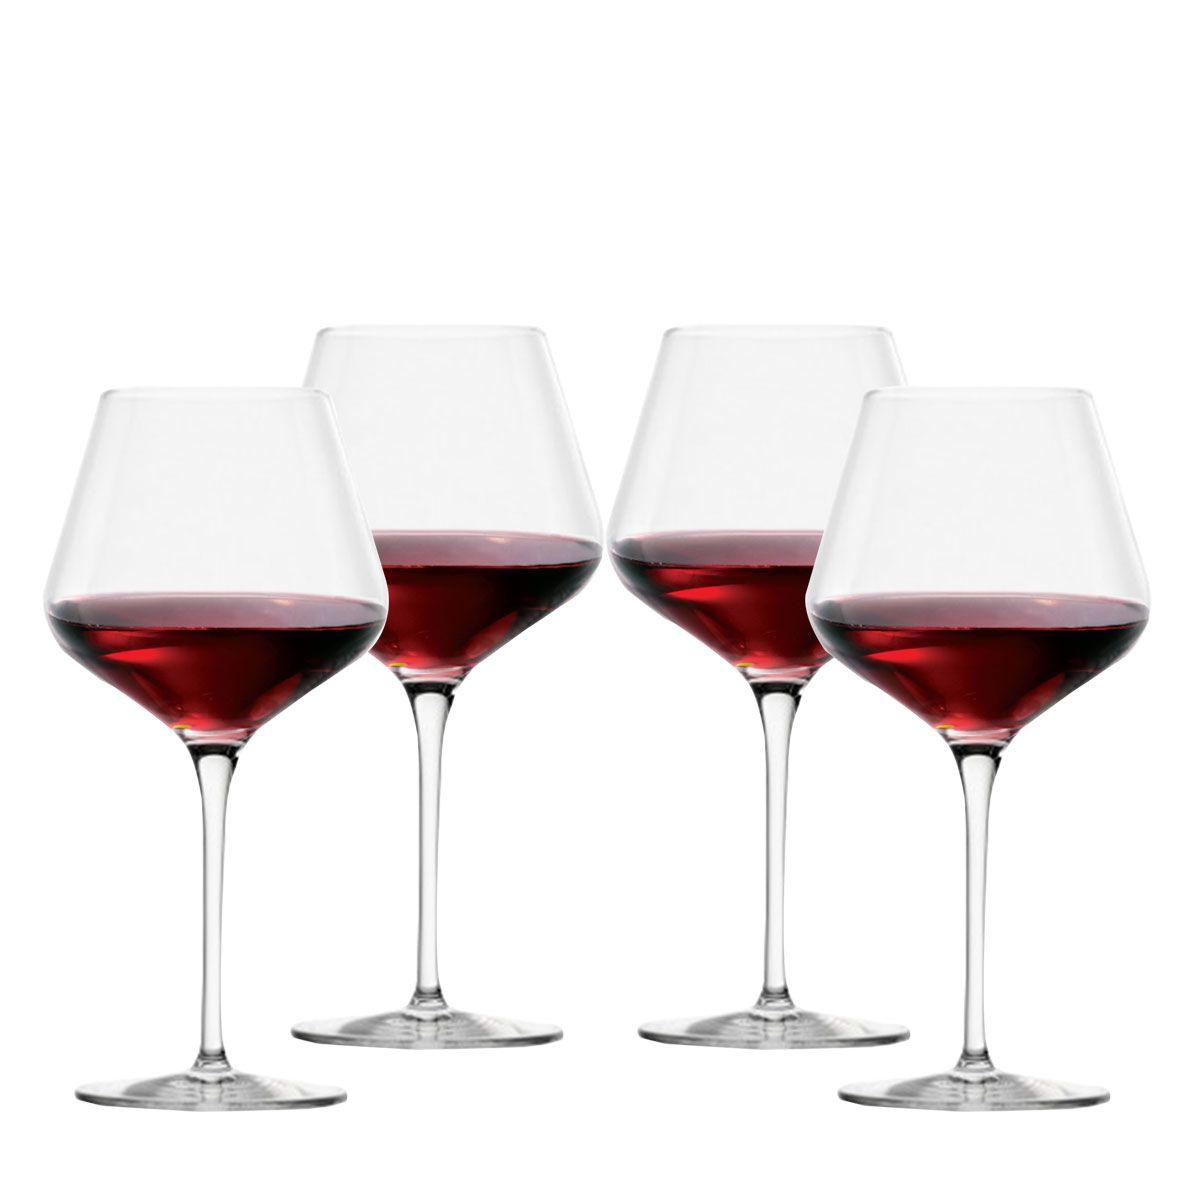 Taça Vinho Tinto - Passion Burgunder 640ml C/ 4 Unid